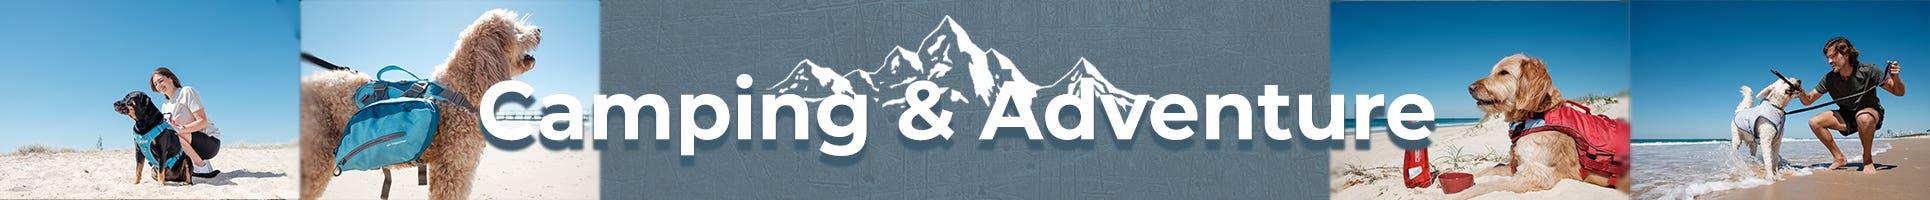 Camping & Adventure